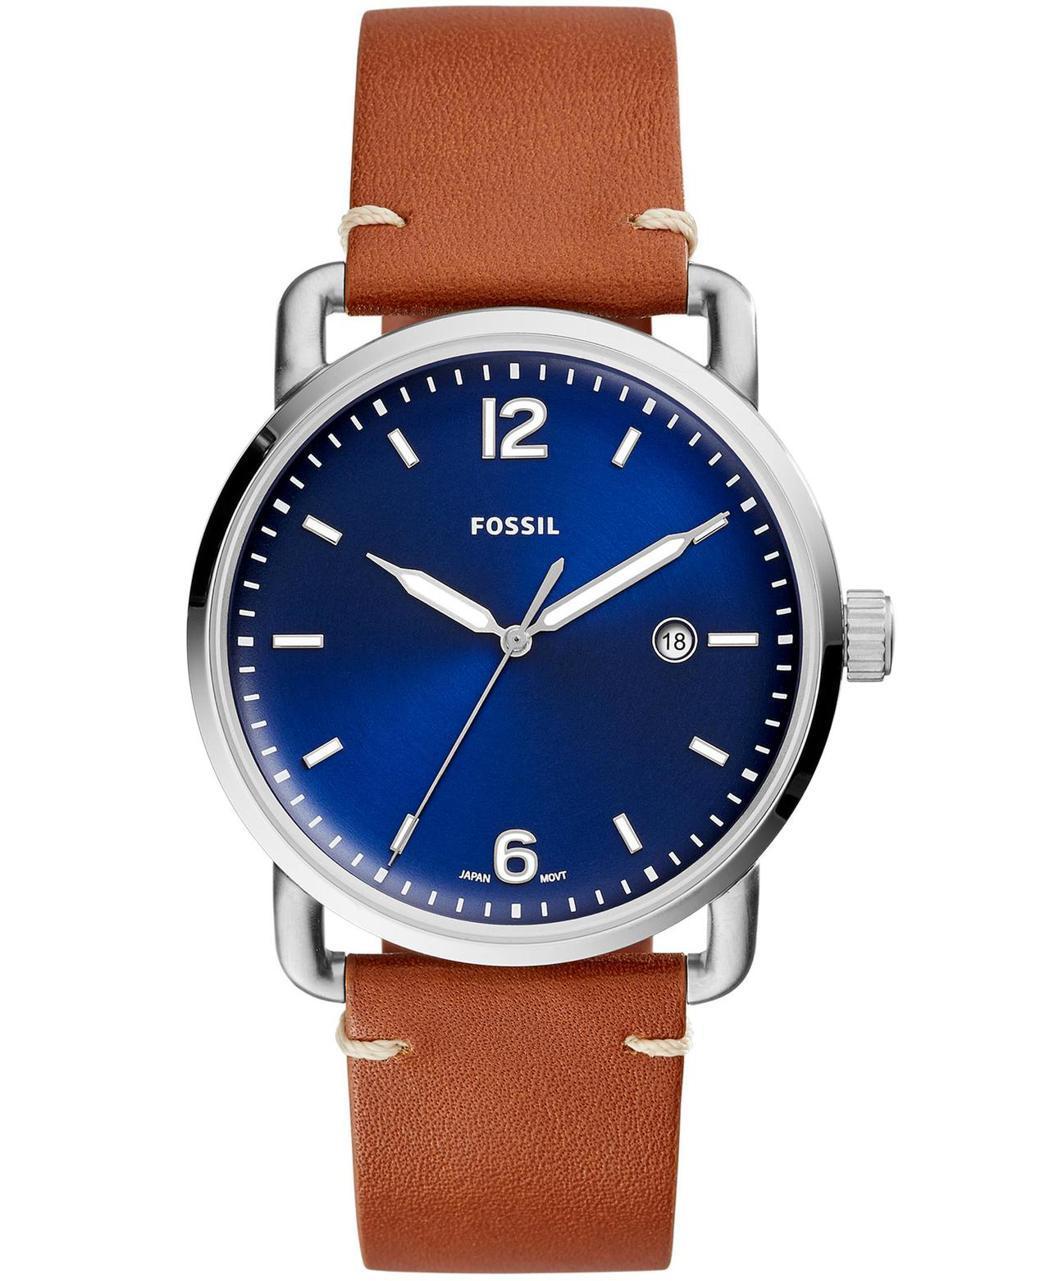 Fossil The Commuter藍色表盤皮革腕表,約3,900元。圖/Fo...